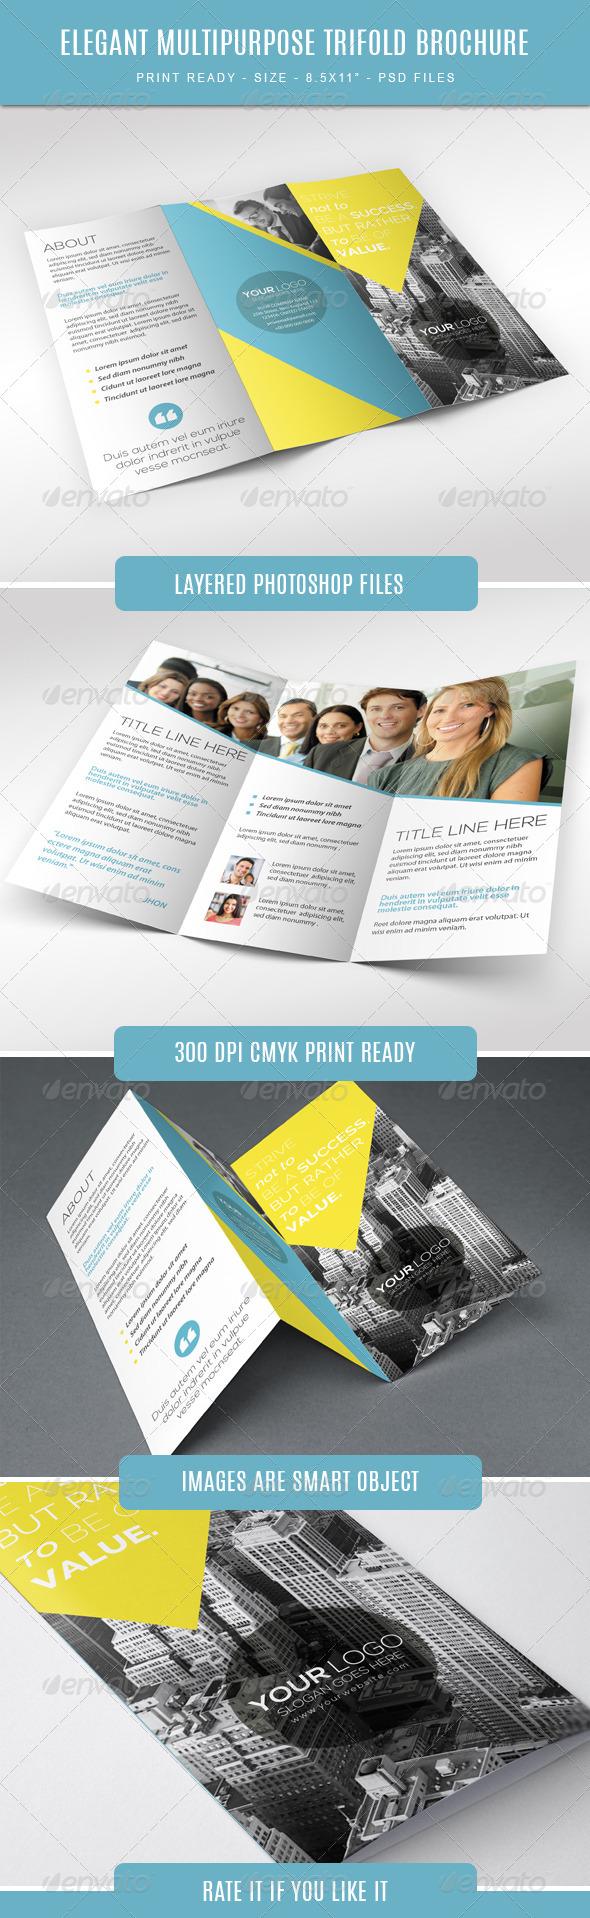 GraphicRiver Elegant Multipurpose Trifold Brochure 7757936